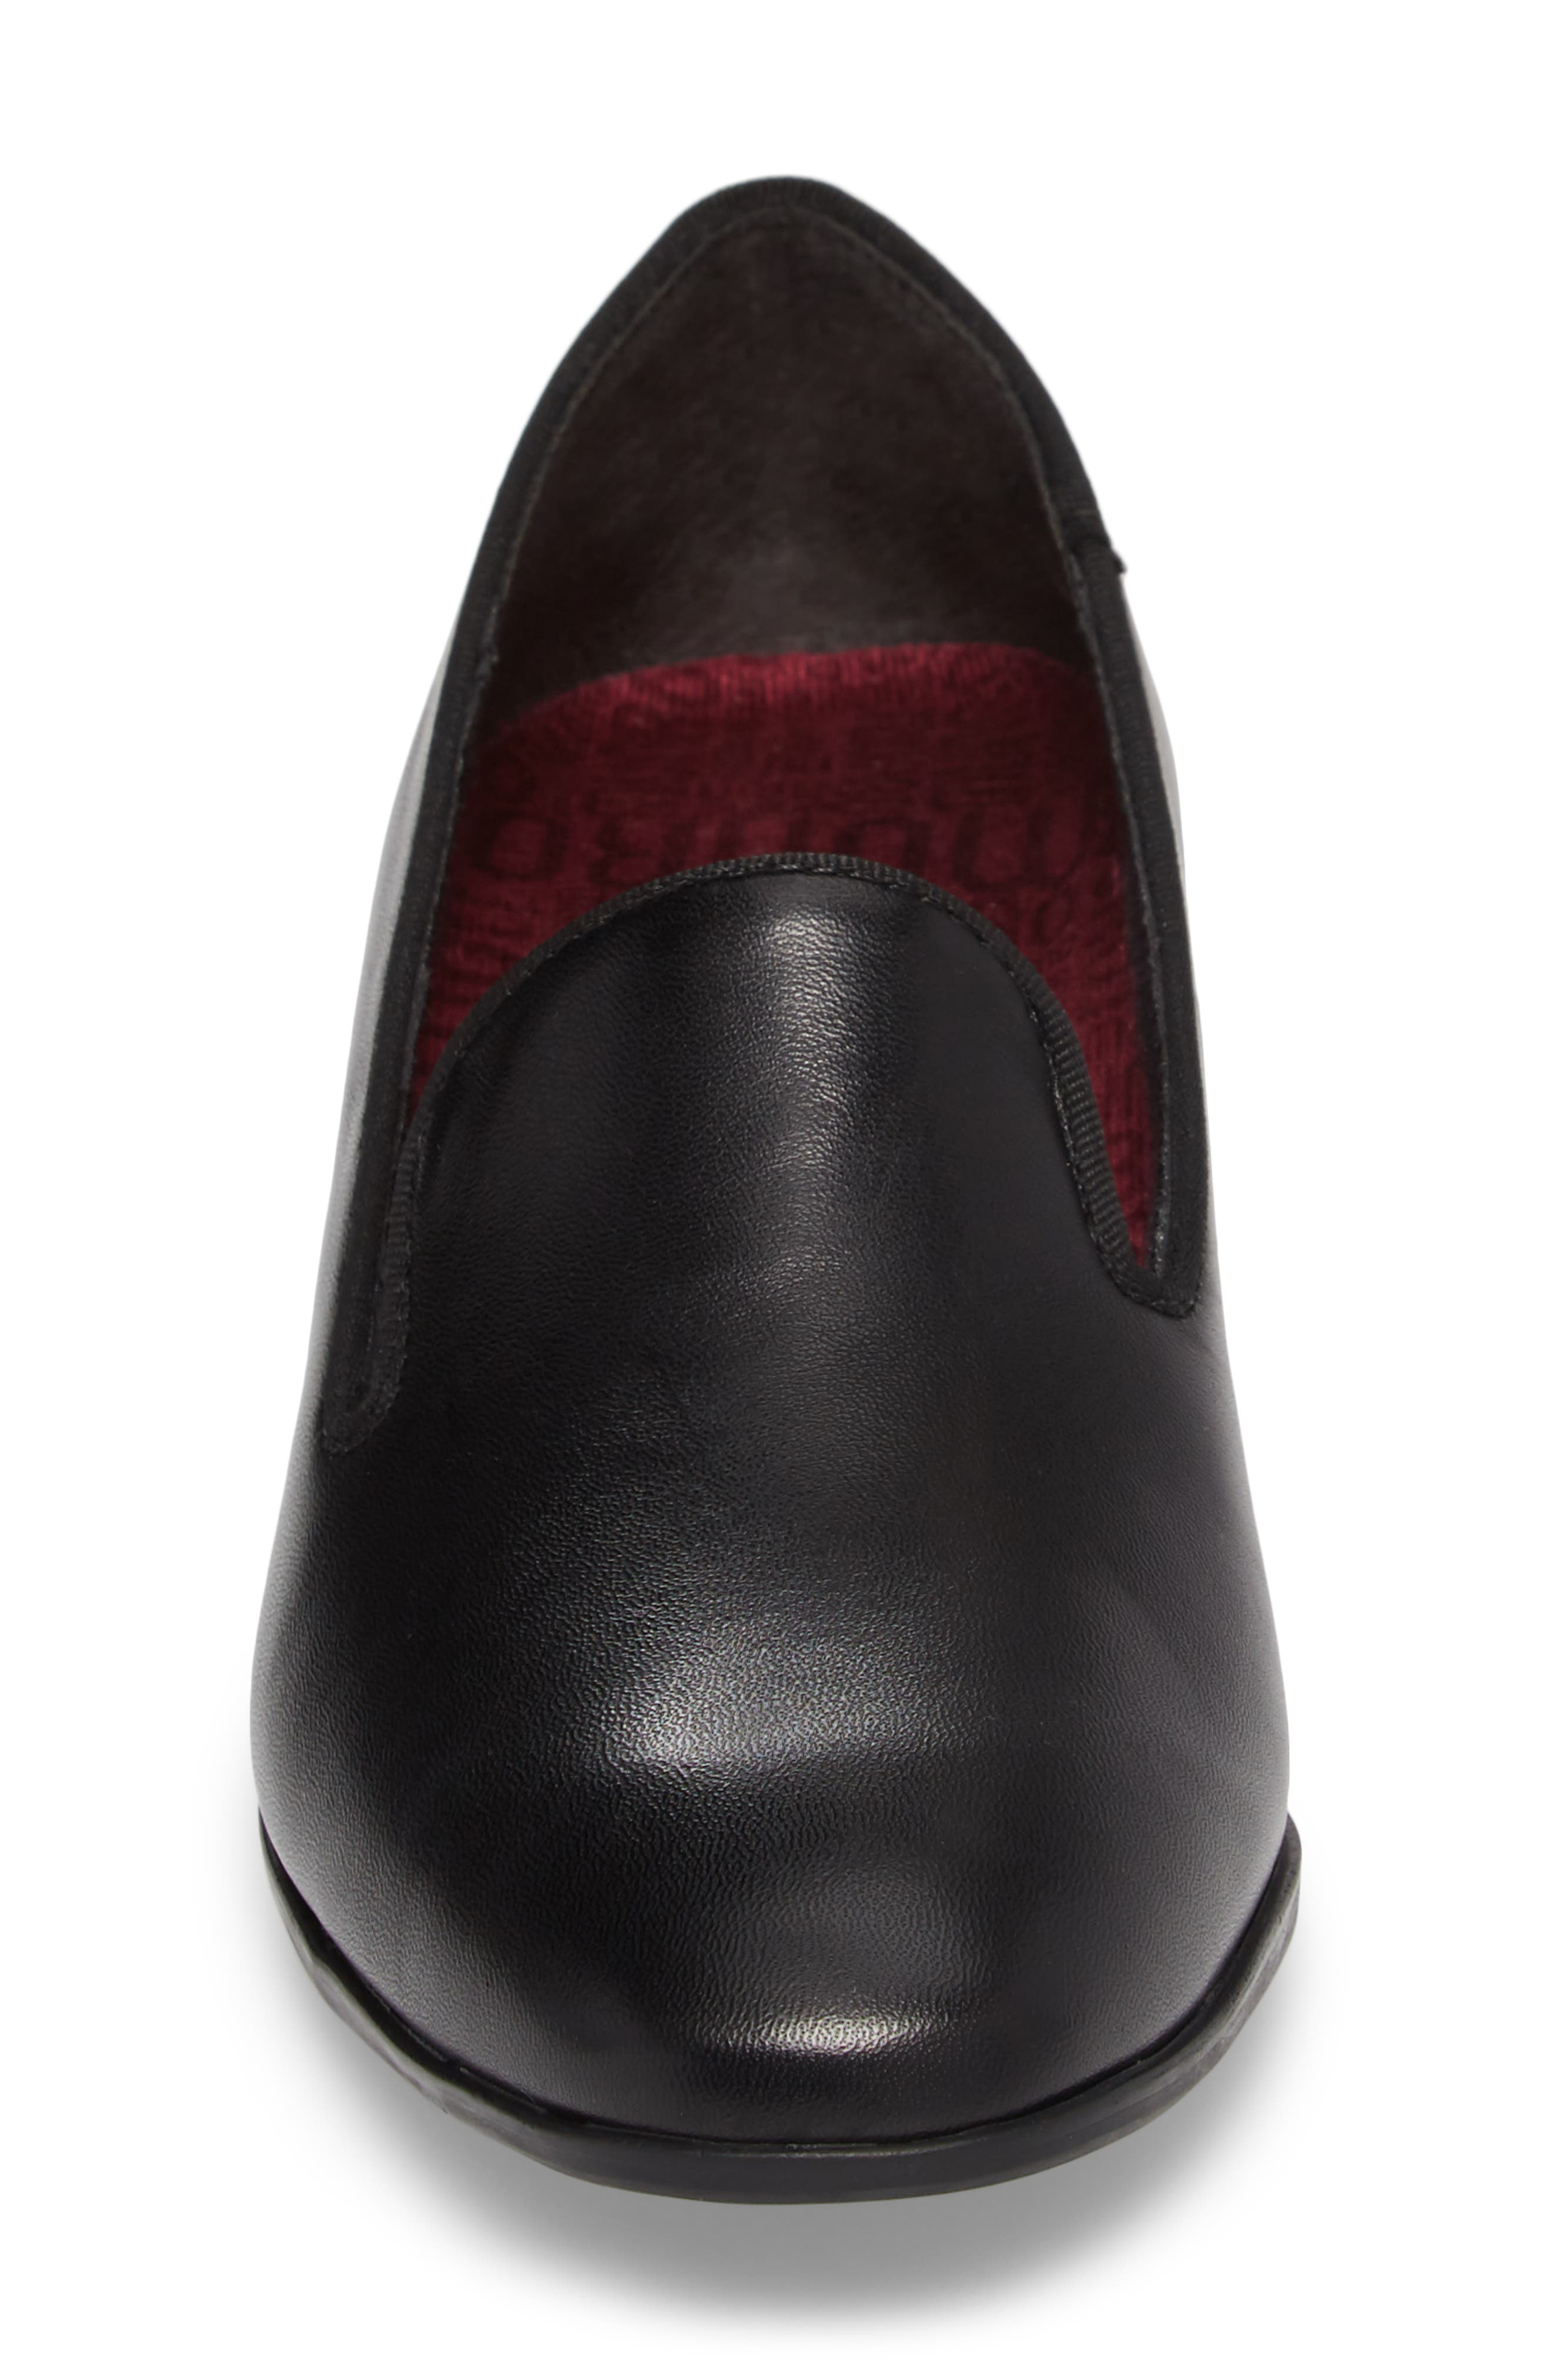 Allee Pump,                             Alternate thumbnail 4, color,                             Black Leather